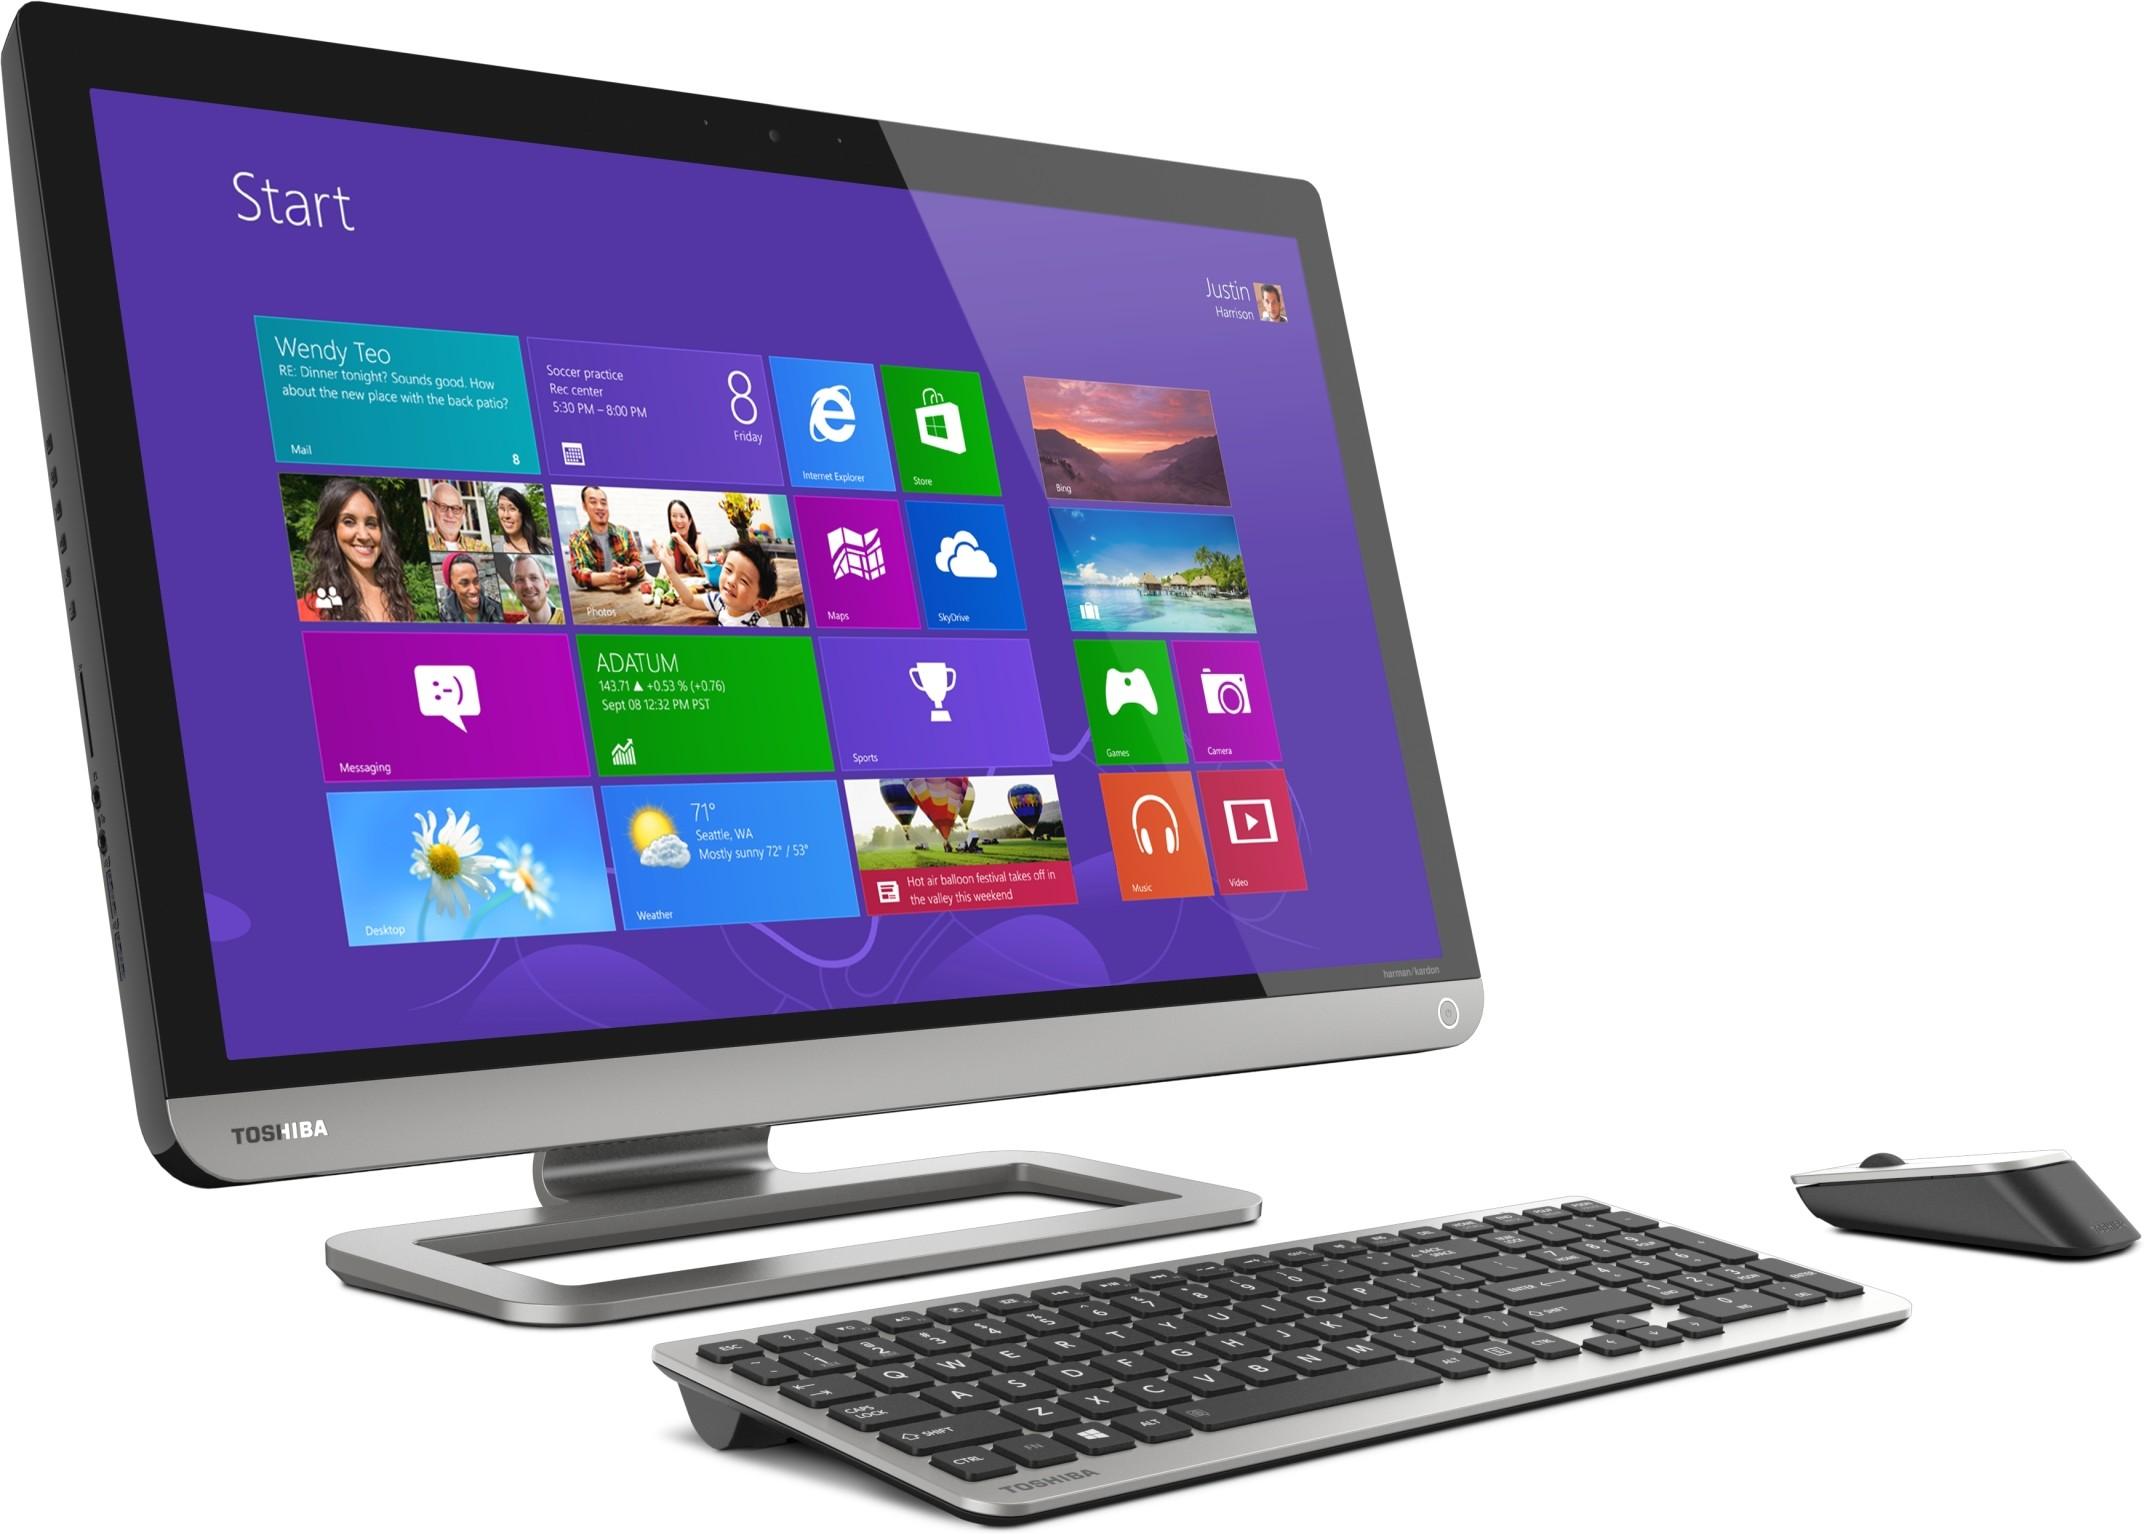 Toshiba Unveils Powerful Entertainment PCs - TechPowerUp ...